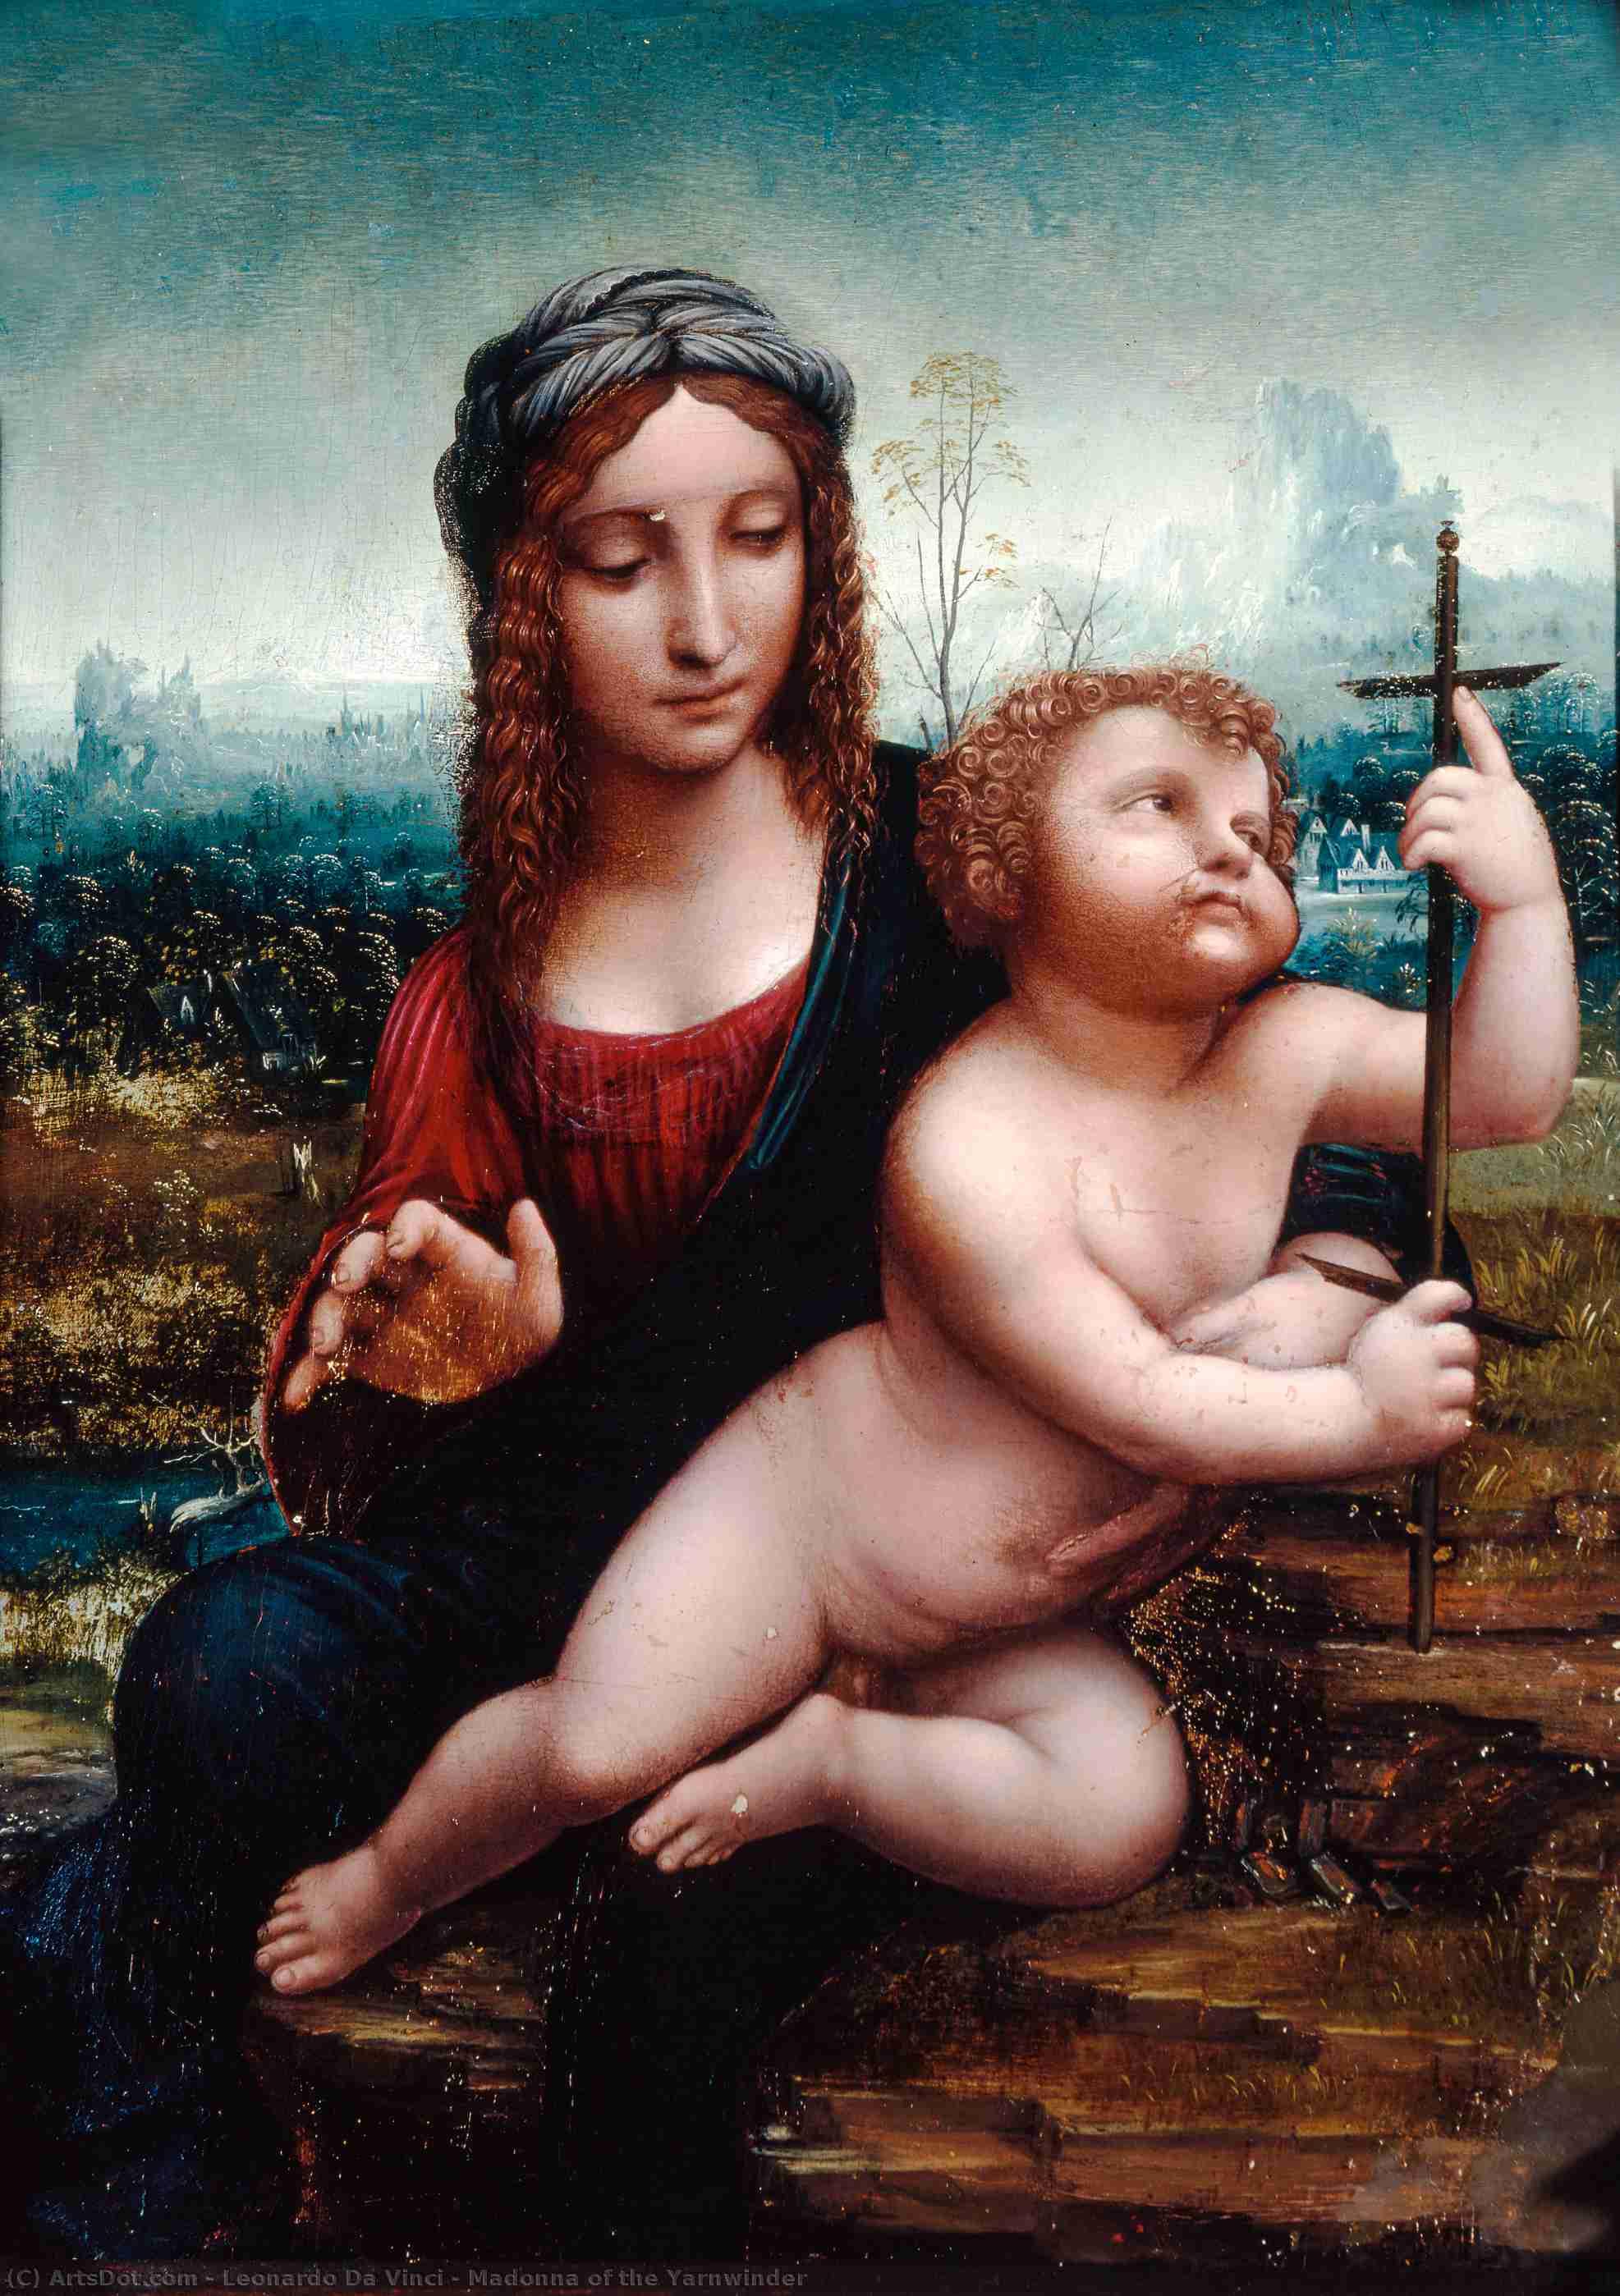 Wikioo.org - The Encyclopedia of Fine Arts - Painting, Artwork by Leonardo Da Vinci - Madonna of the Yarnwinder